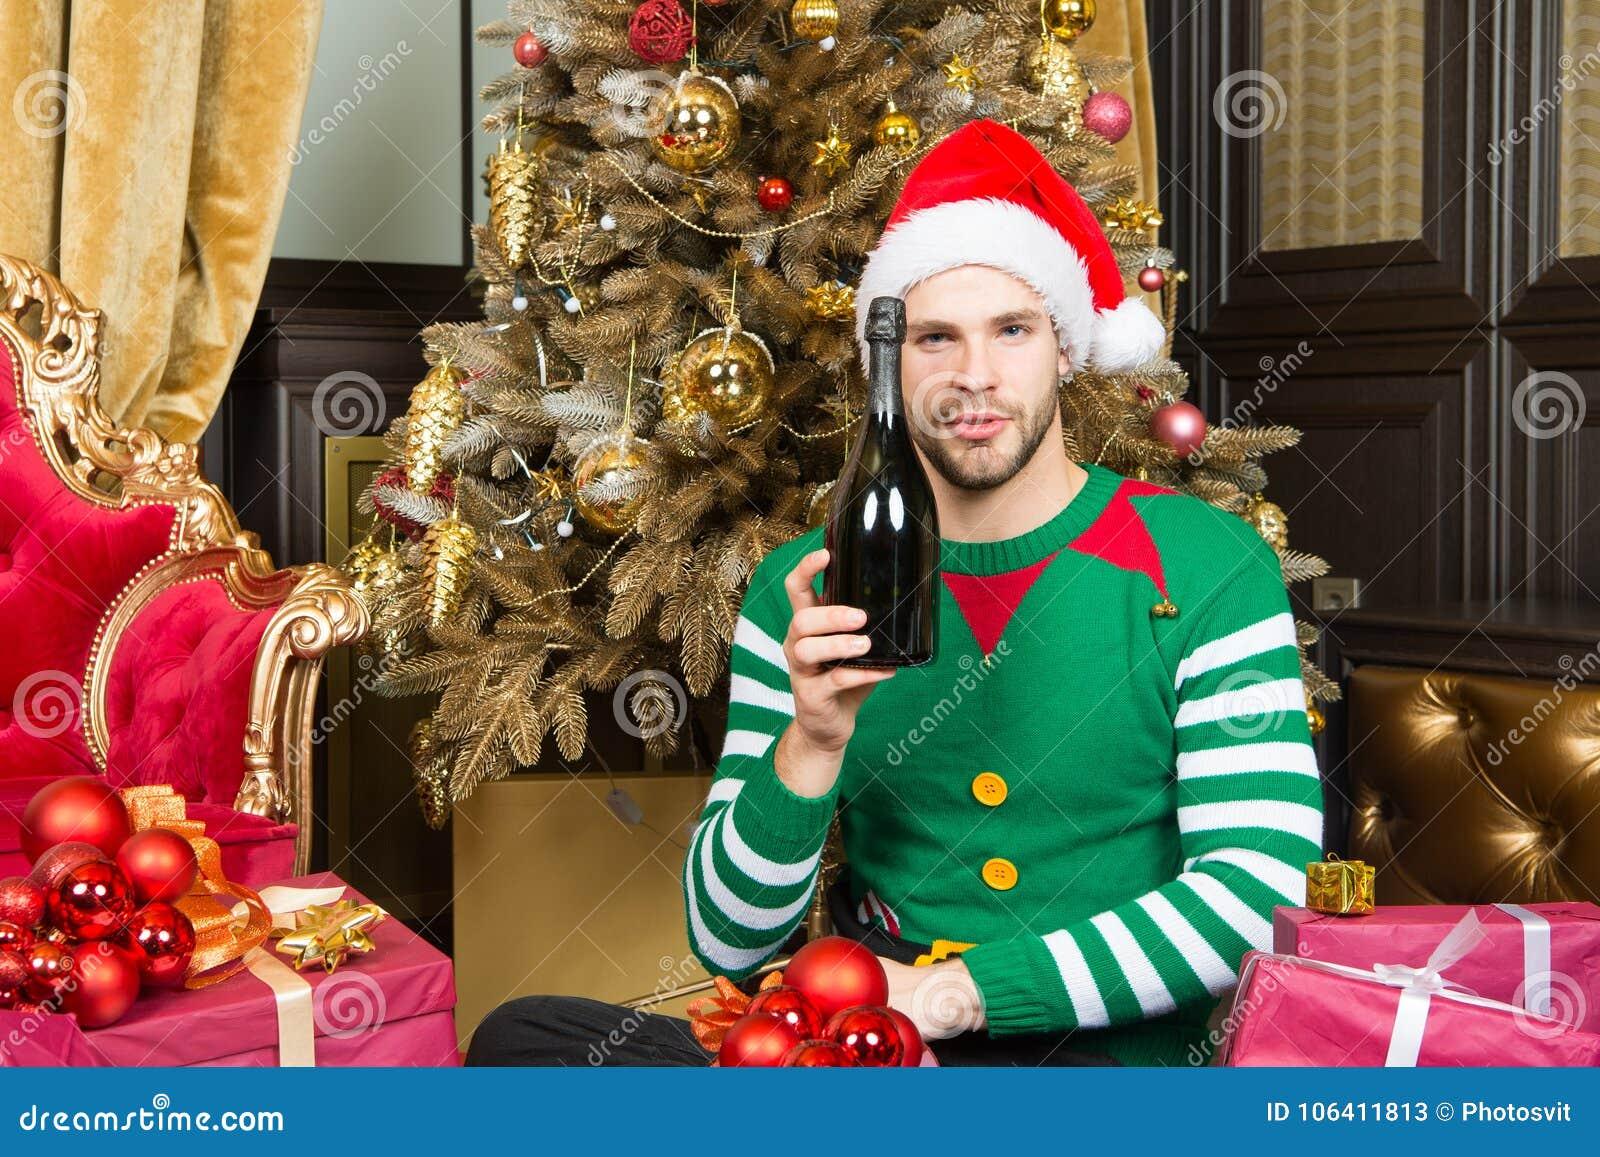 Cat animals christmas tree santa costume wallpaper and background